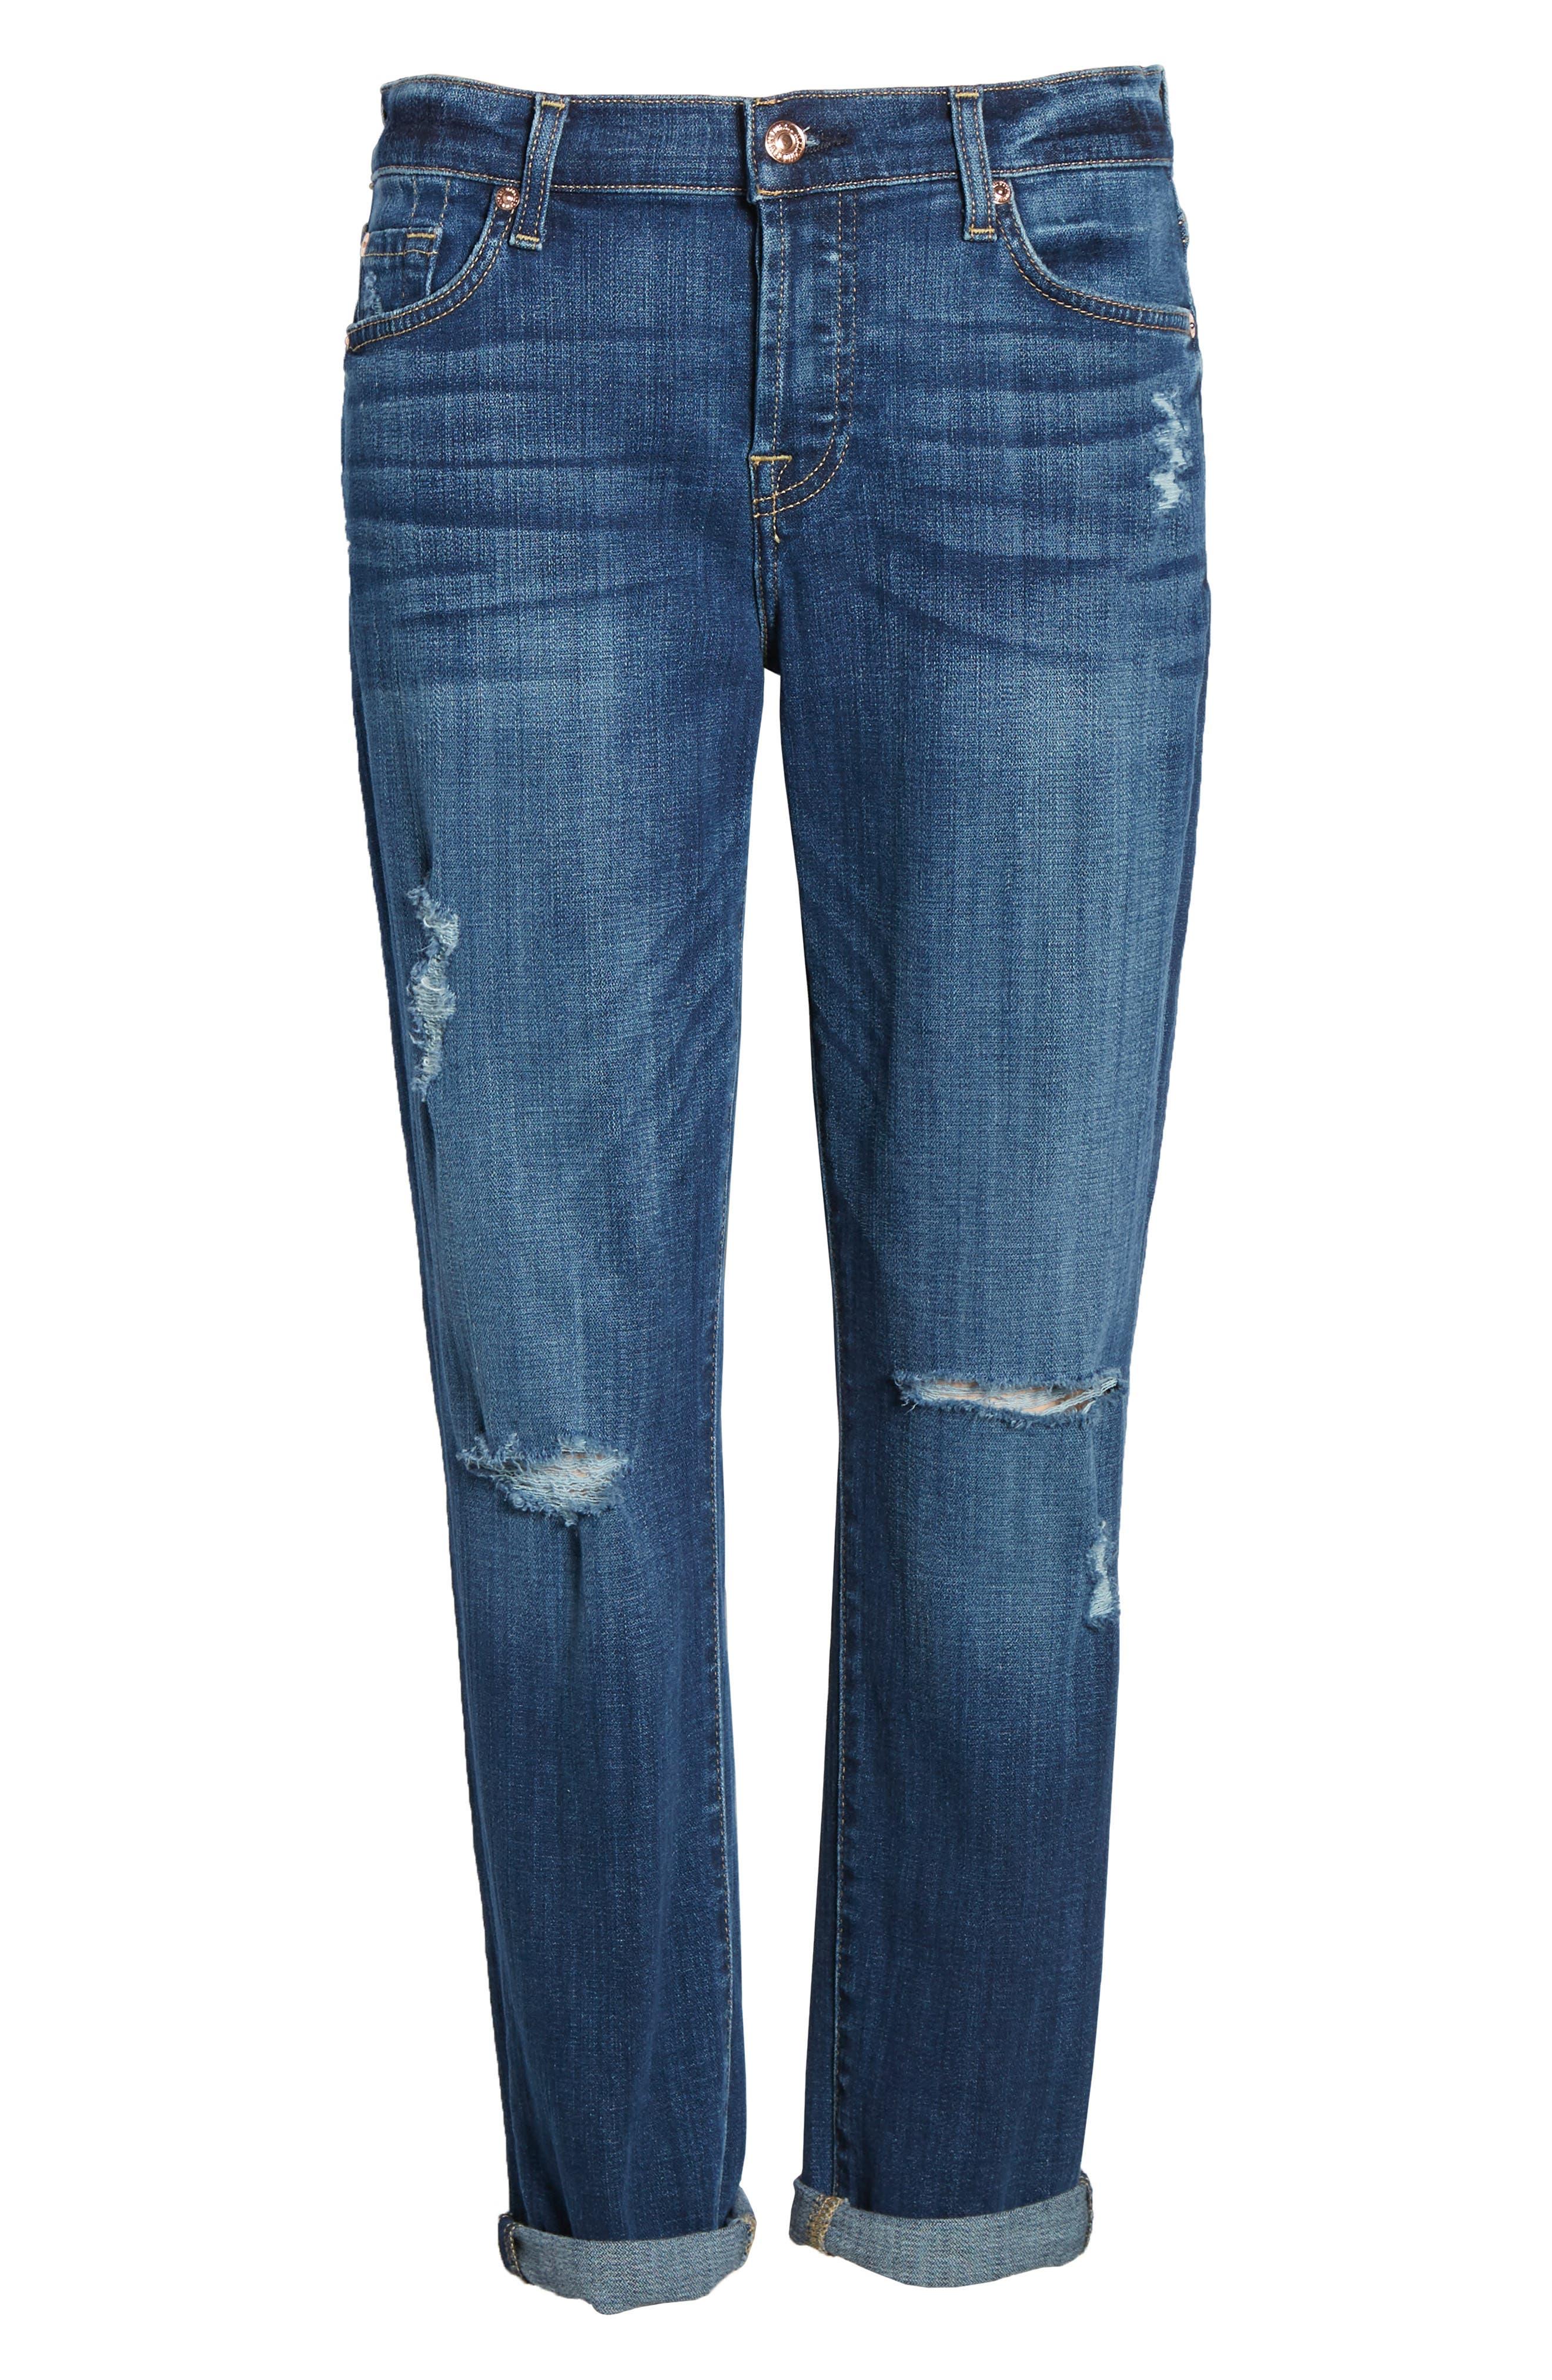 7 FOR ALL MANKIND<SUP>®</SUP>, Josefina Boyfriend Jeans, Alternate thumbnail 7, color, BROKEN TWILL VANITY W/ DESTROY